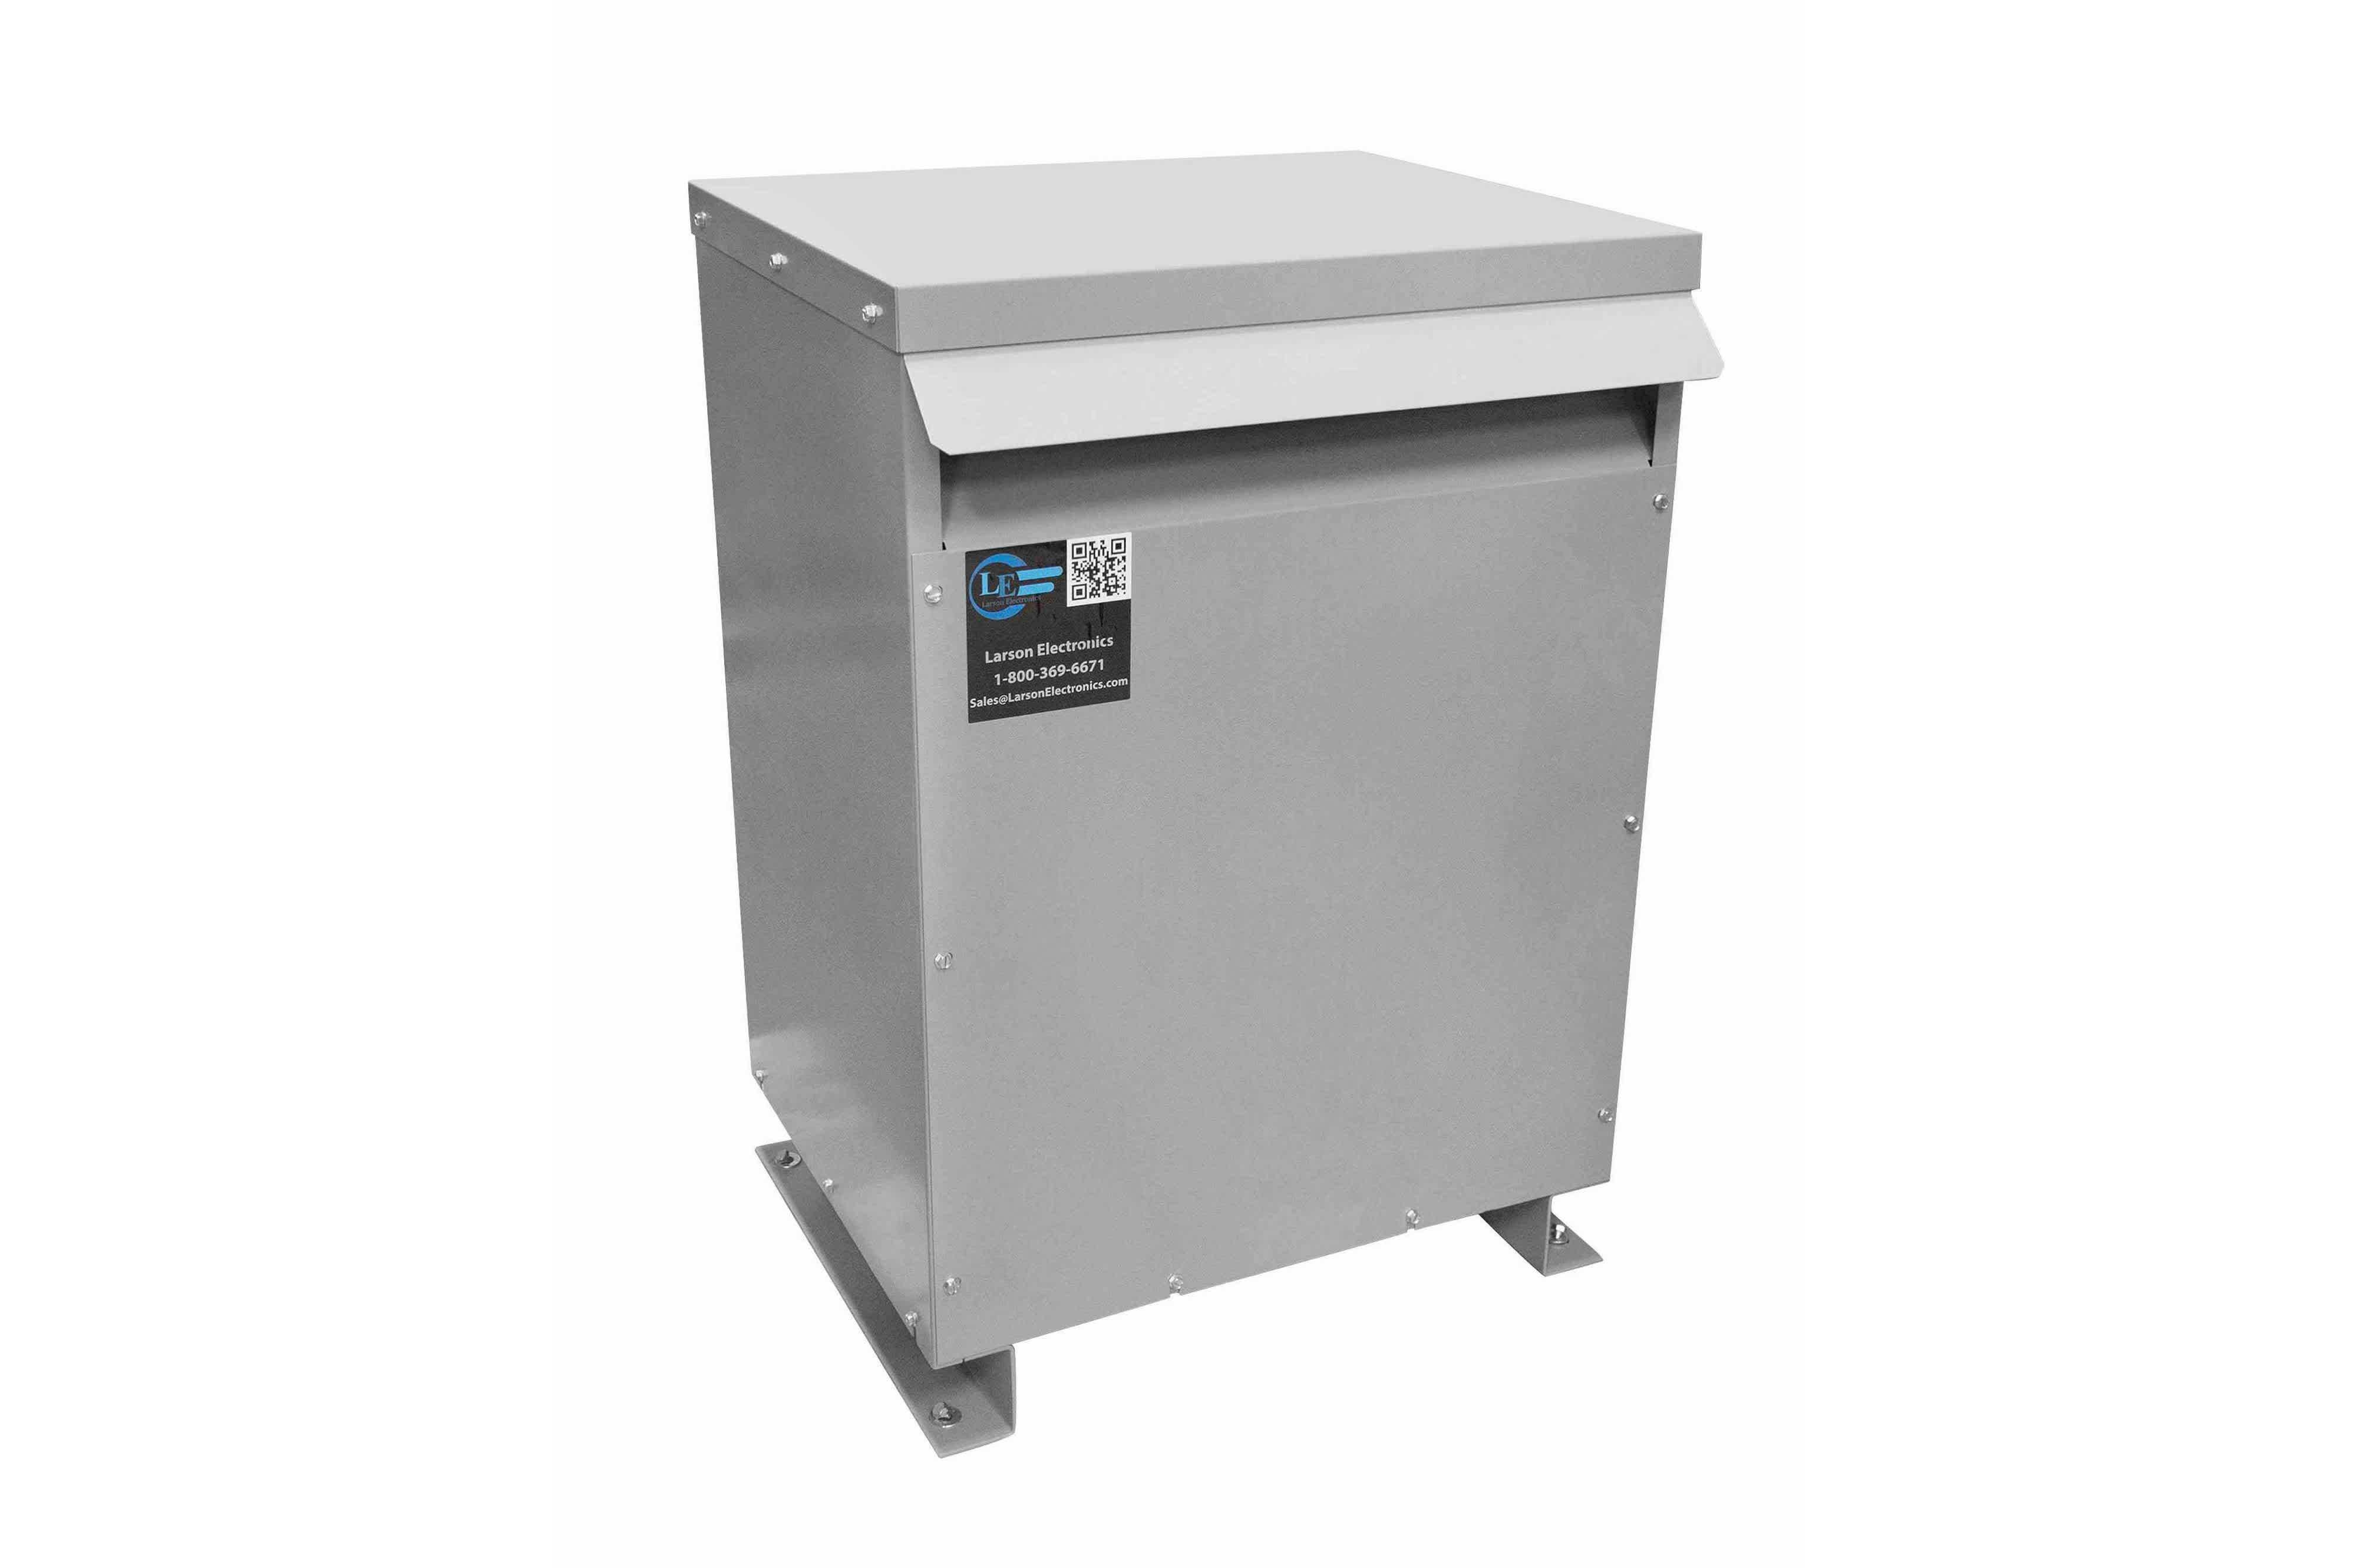 125 kVA 3PH Isolation Transformer, 480V Wye Primary, 380Y/220 Wye-N Secondary, N3R, Ventilated, 60 Hz